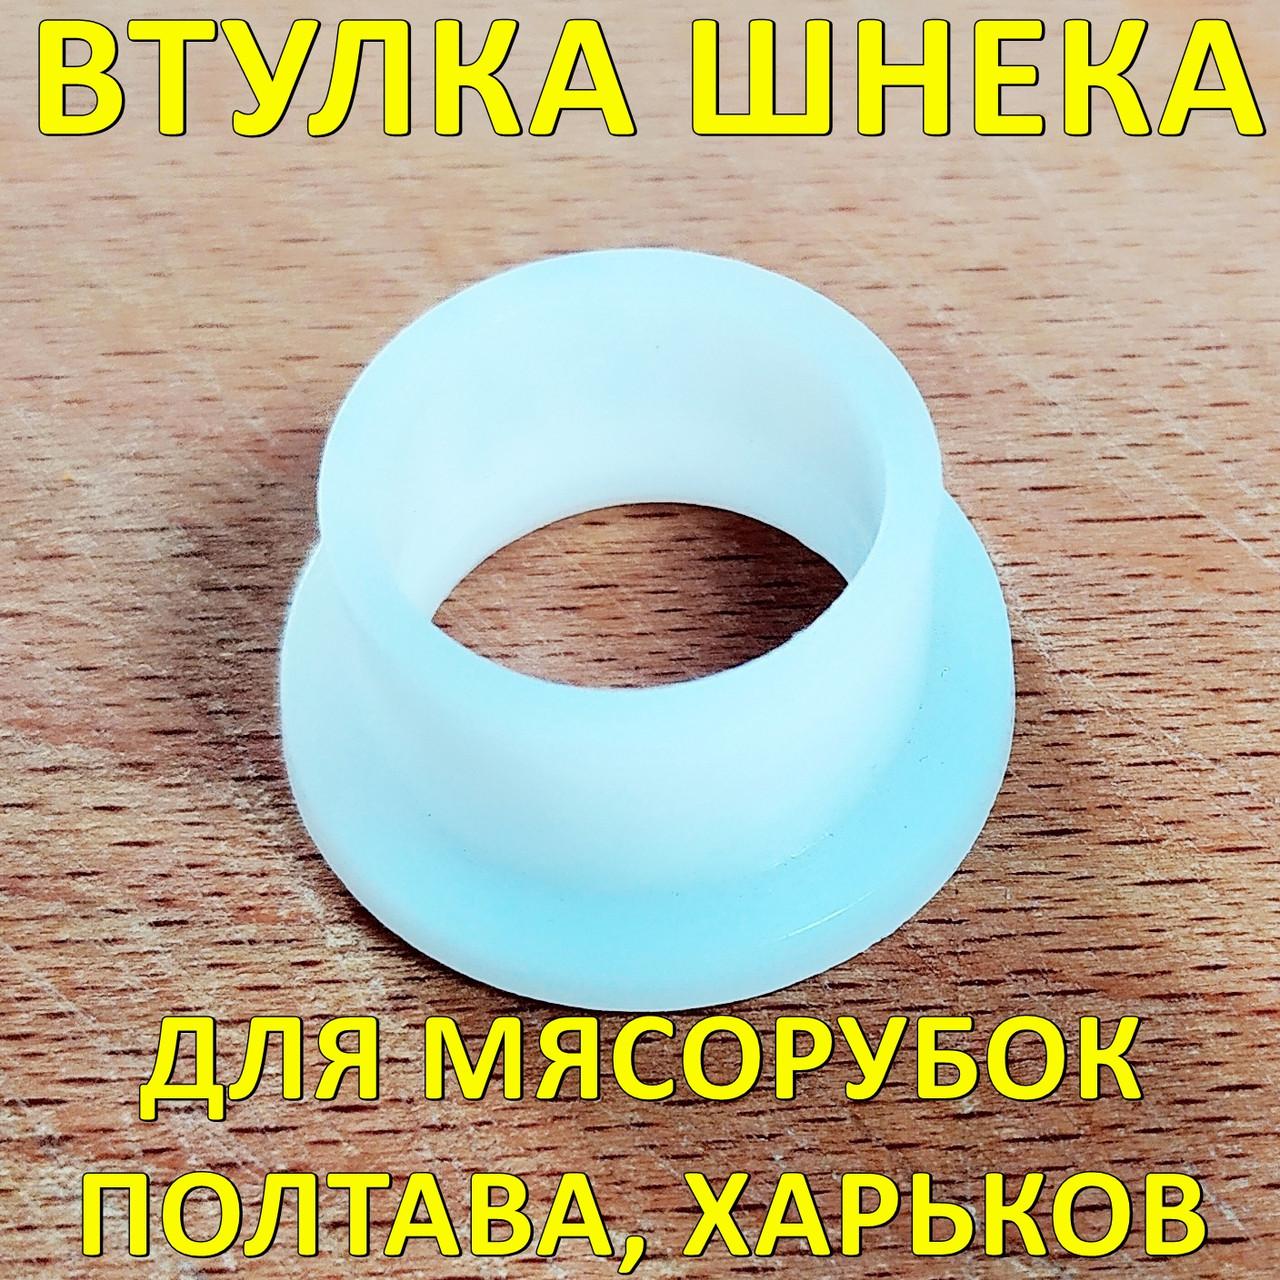 Втулка шнека на ручную мясорубку Полтава, Харьков.